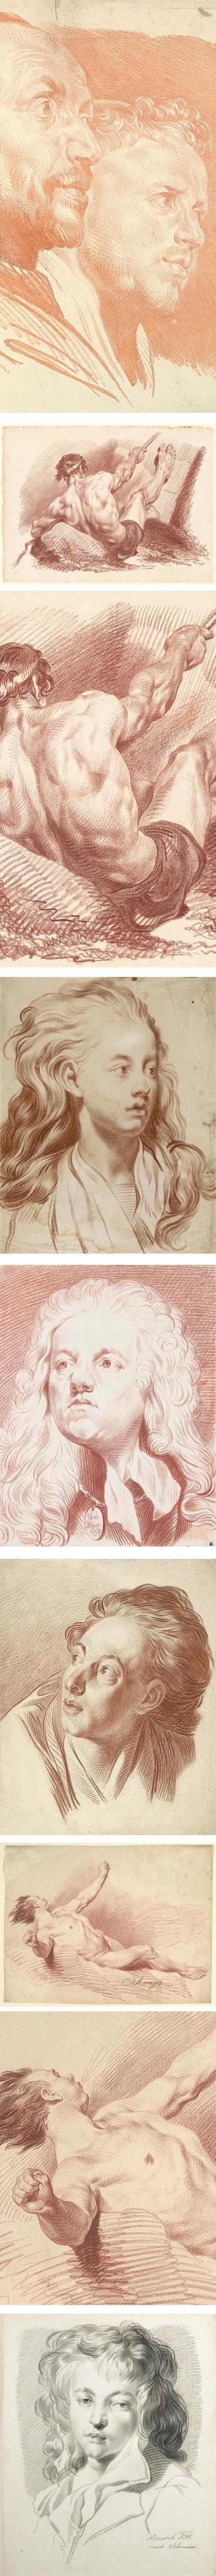 Jakob Matthias Schmutzer chalk drawings